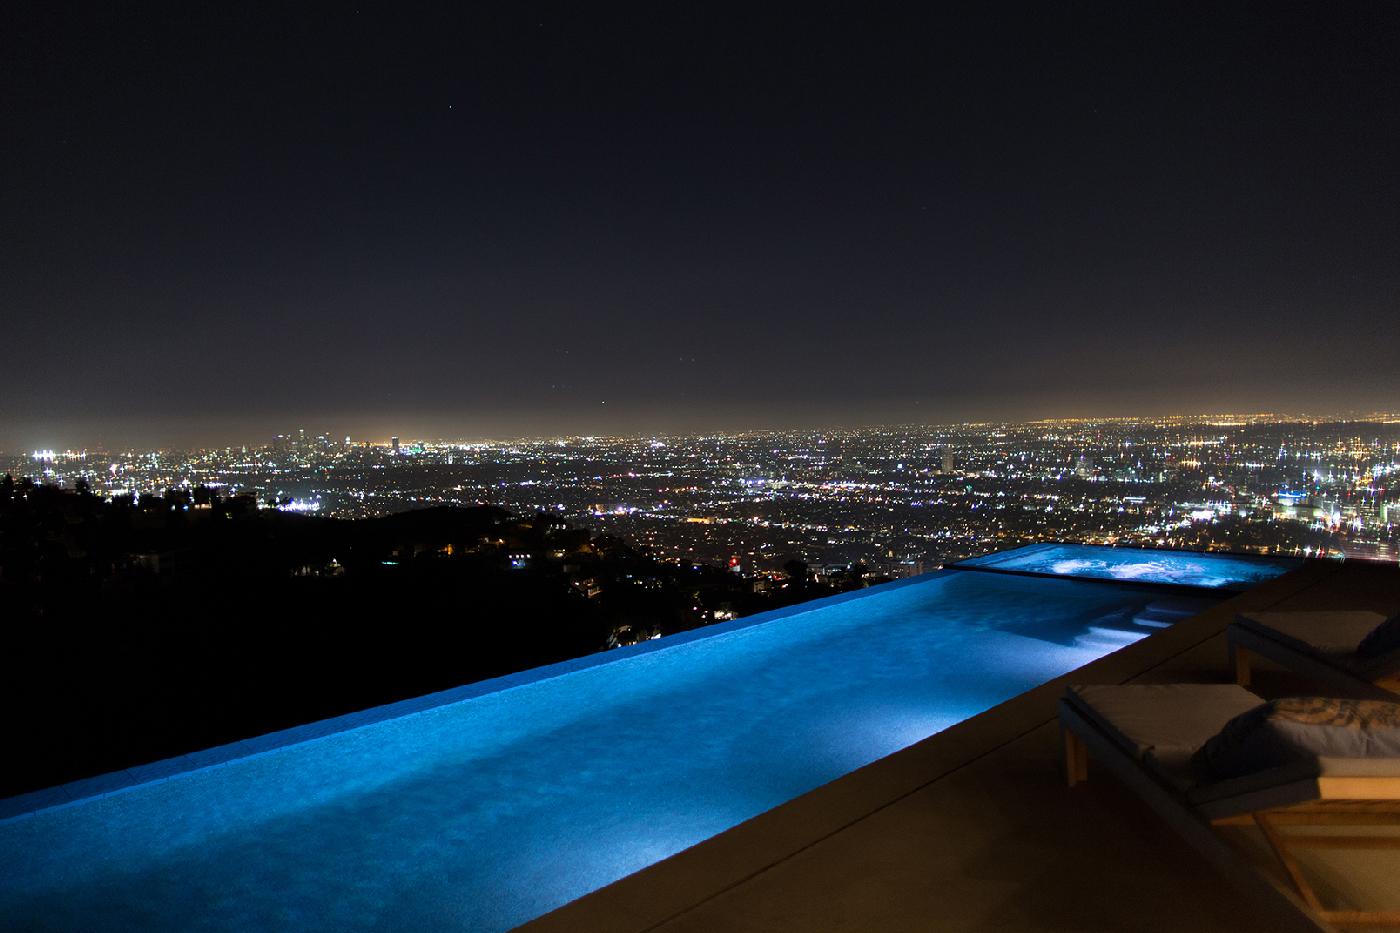 pool-at-night_smallersize.jpg